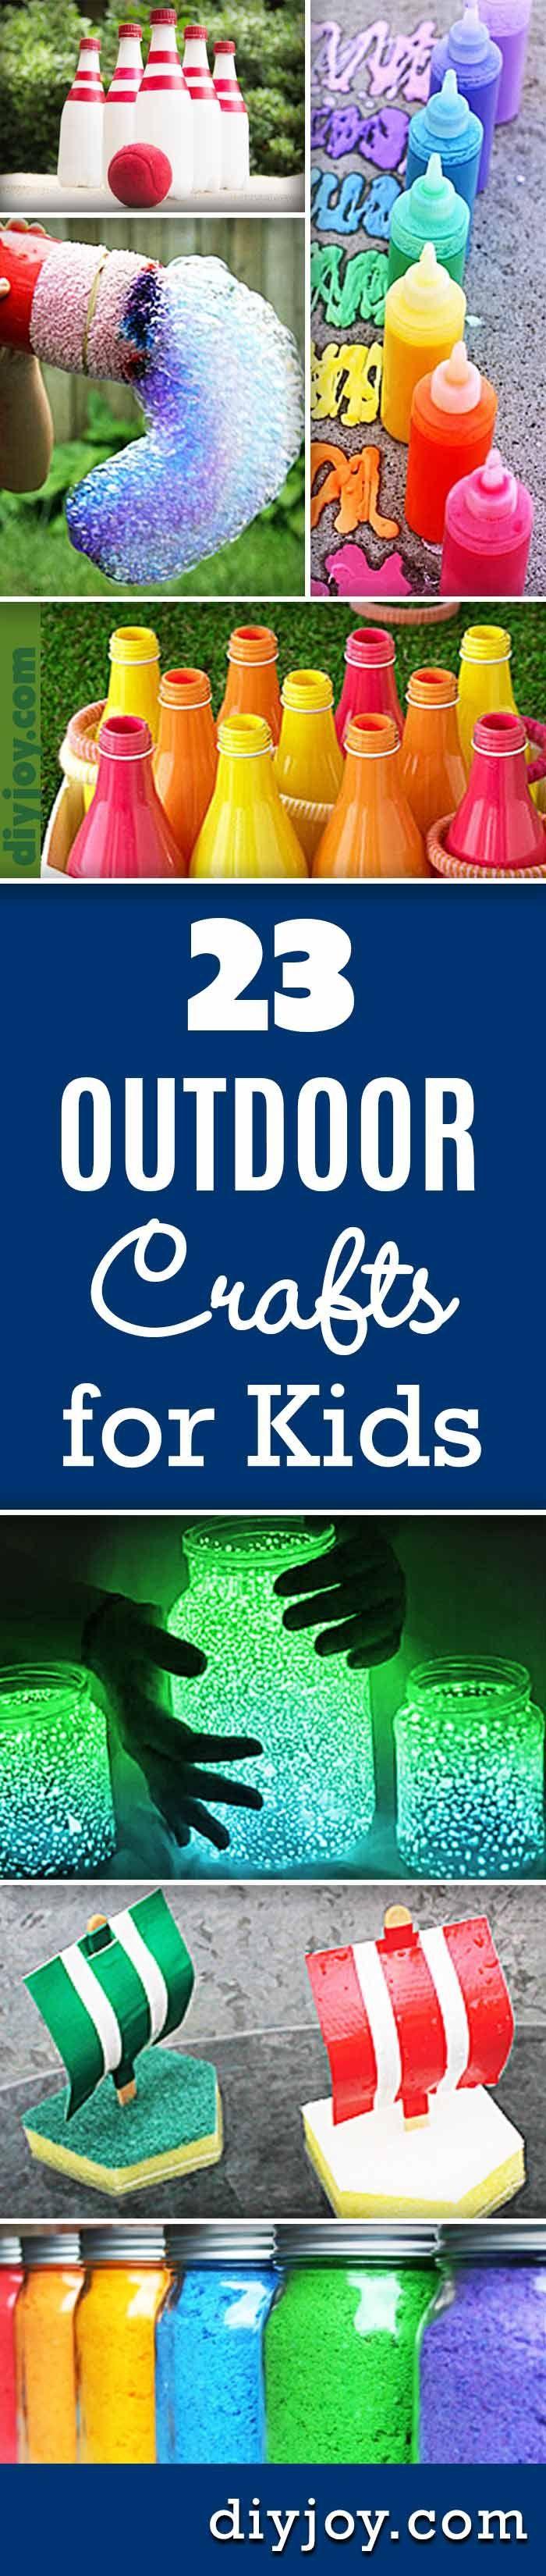 Garden Craft Ideas For Kids Picture 2018